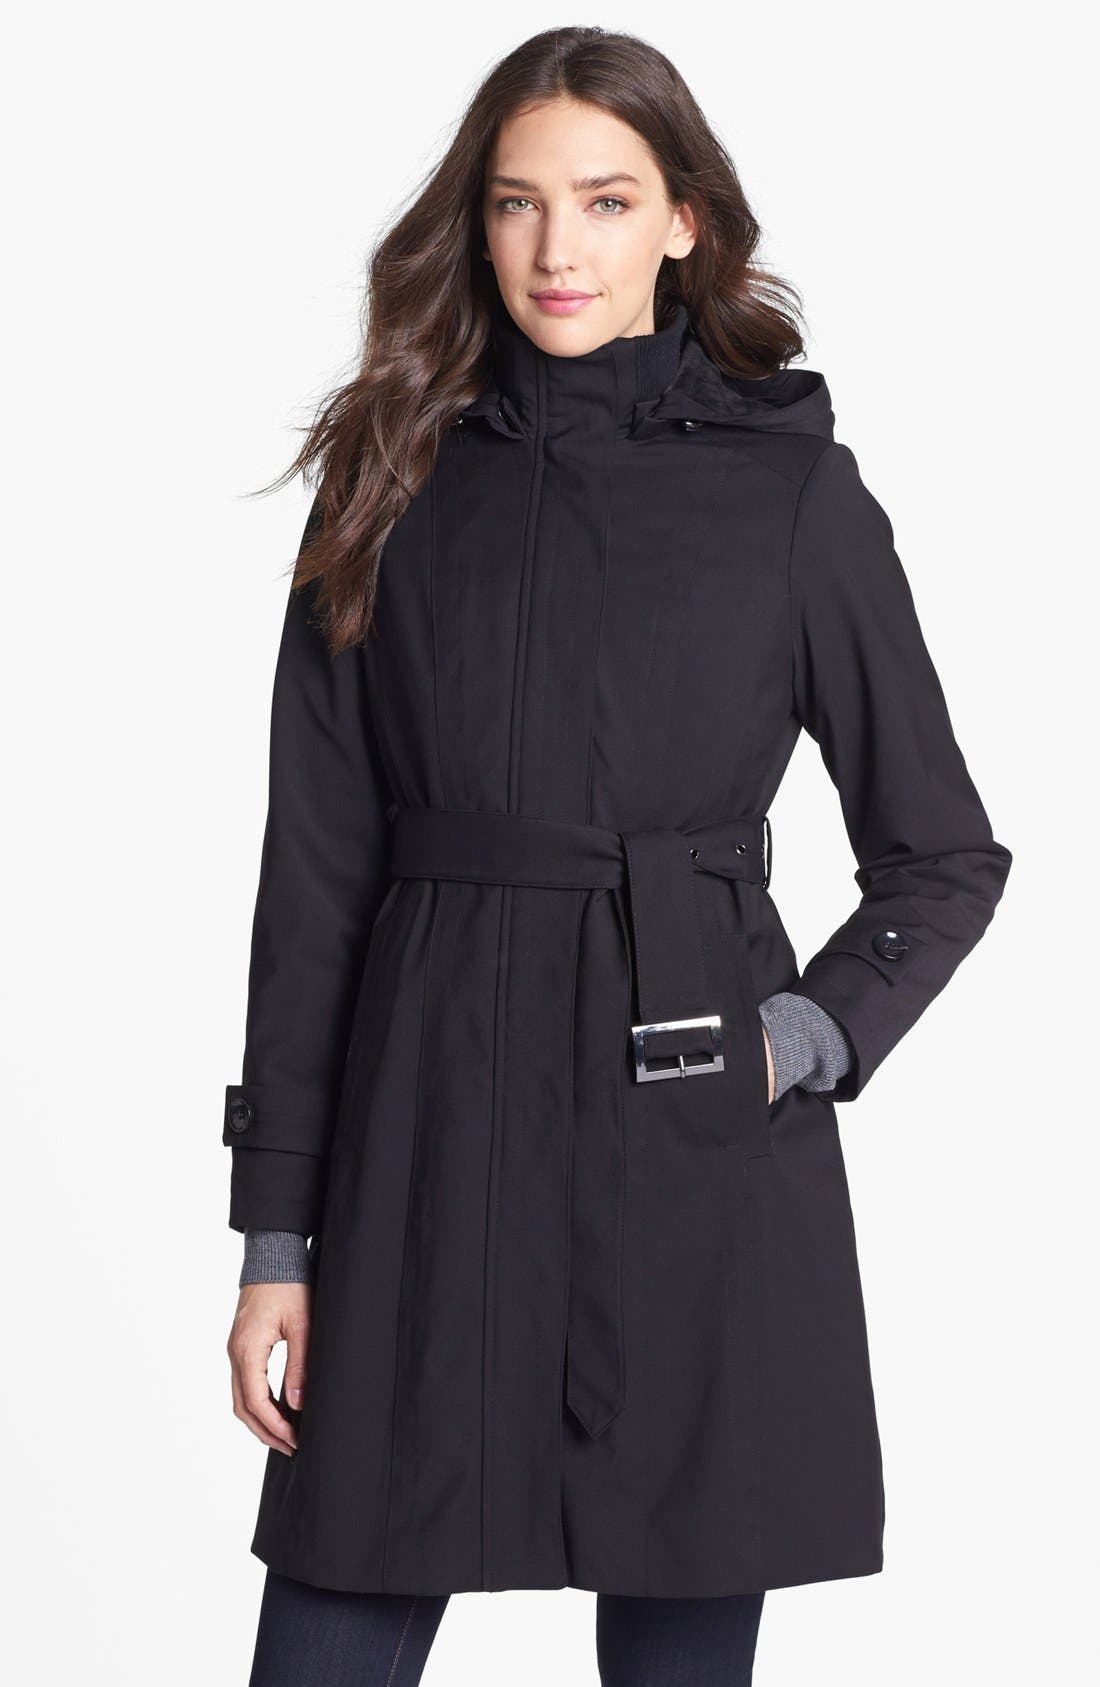 Main Image - Kristen Blake Raincoat with Detachable Hood & Liner (Petite) (Nordstrom Exclusive)